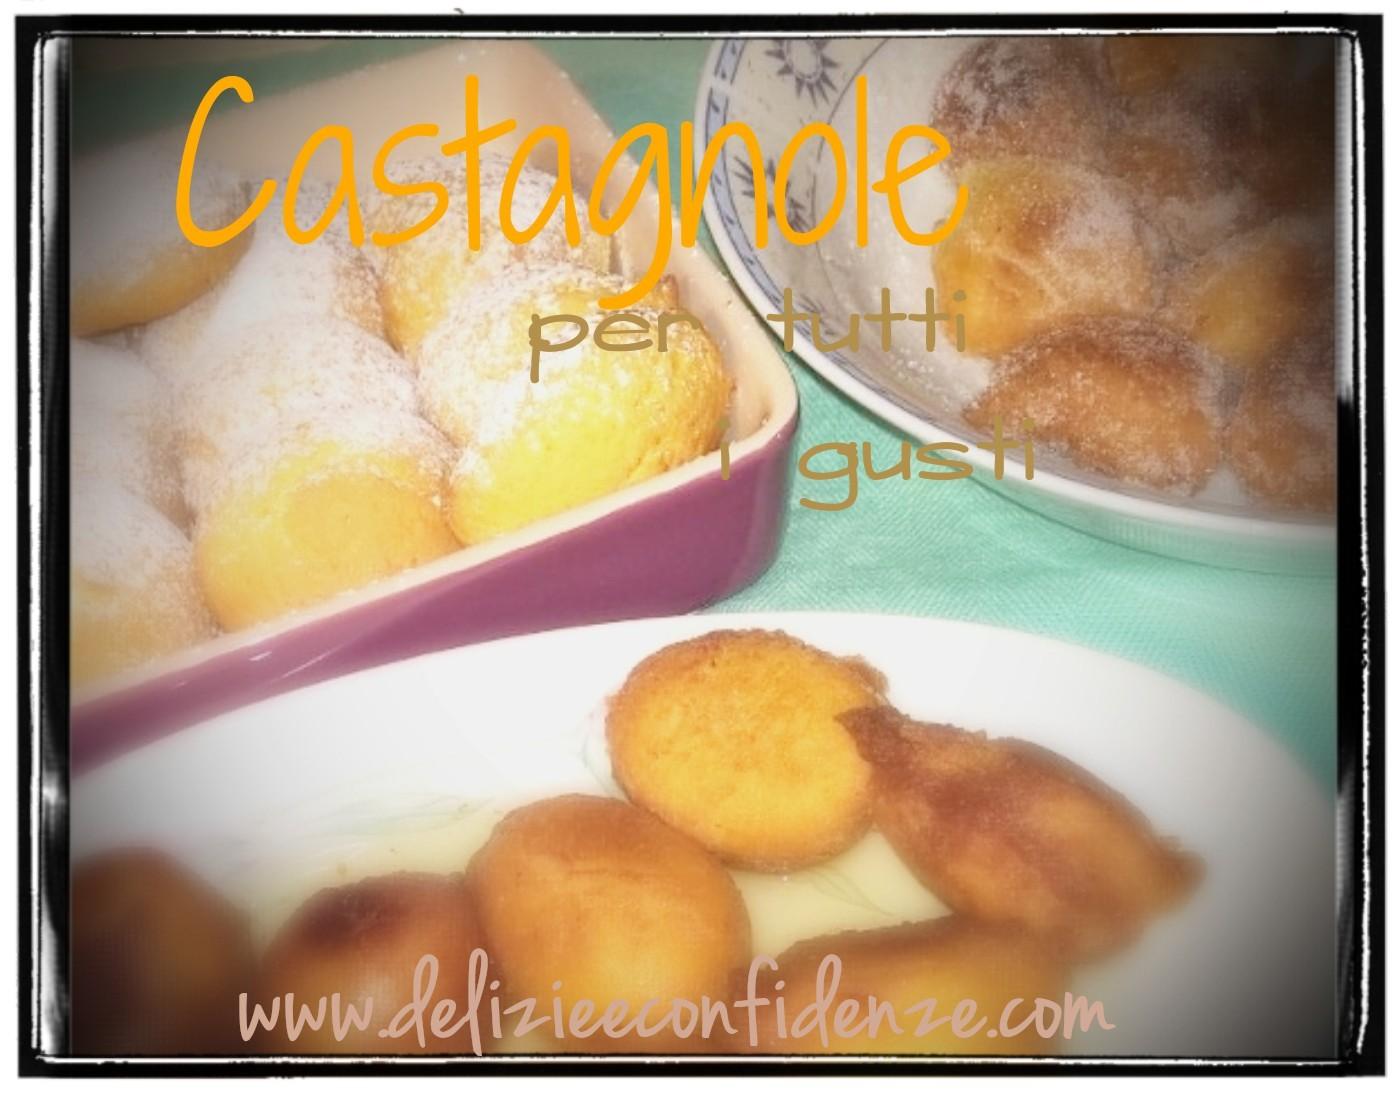 Neri S Cakes Cupcakes Garner Nc